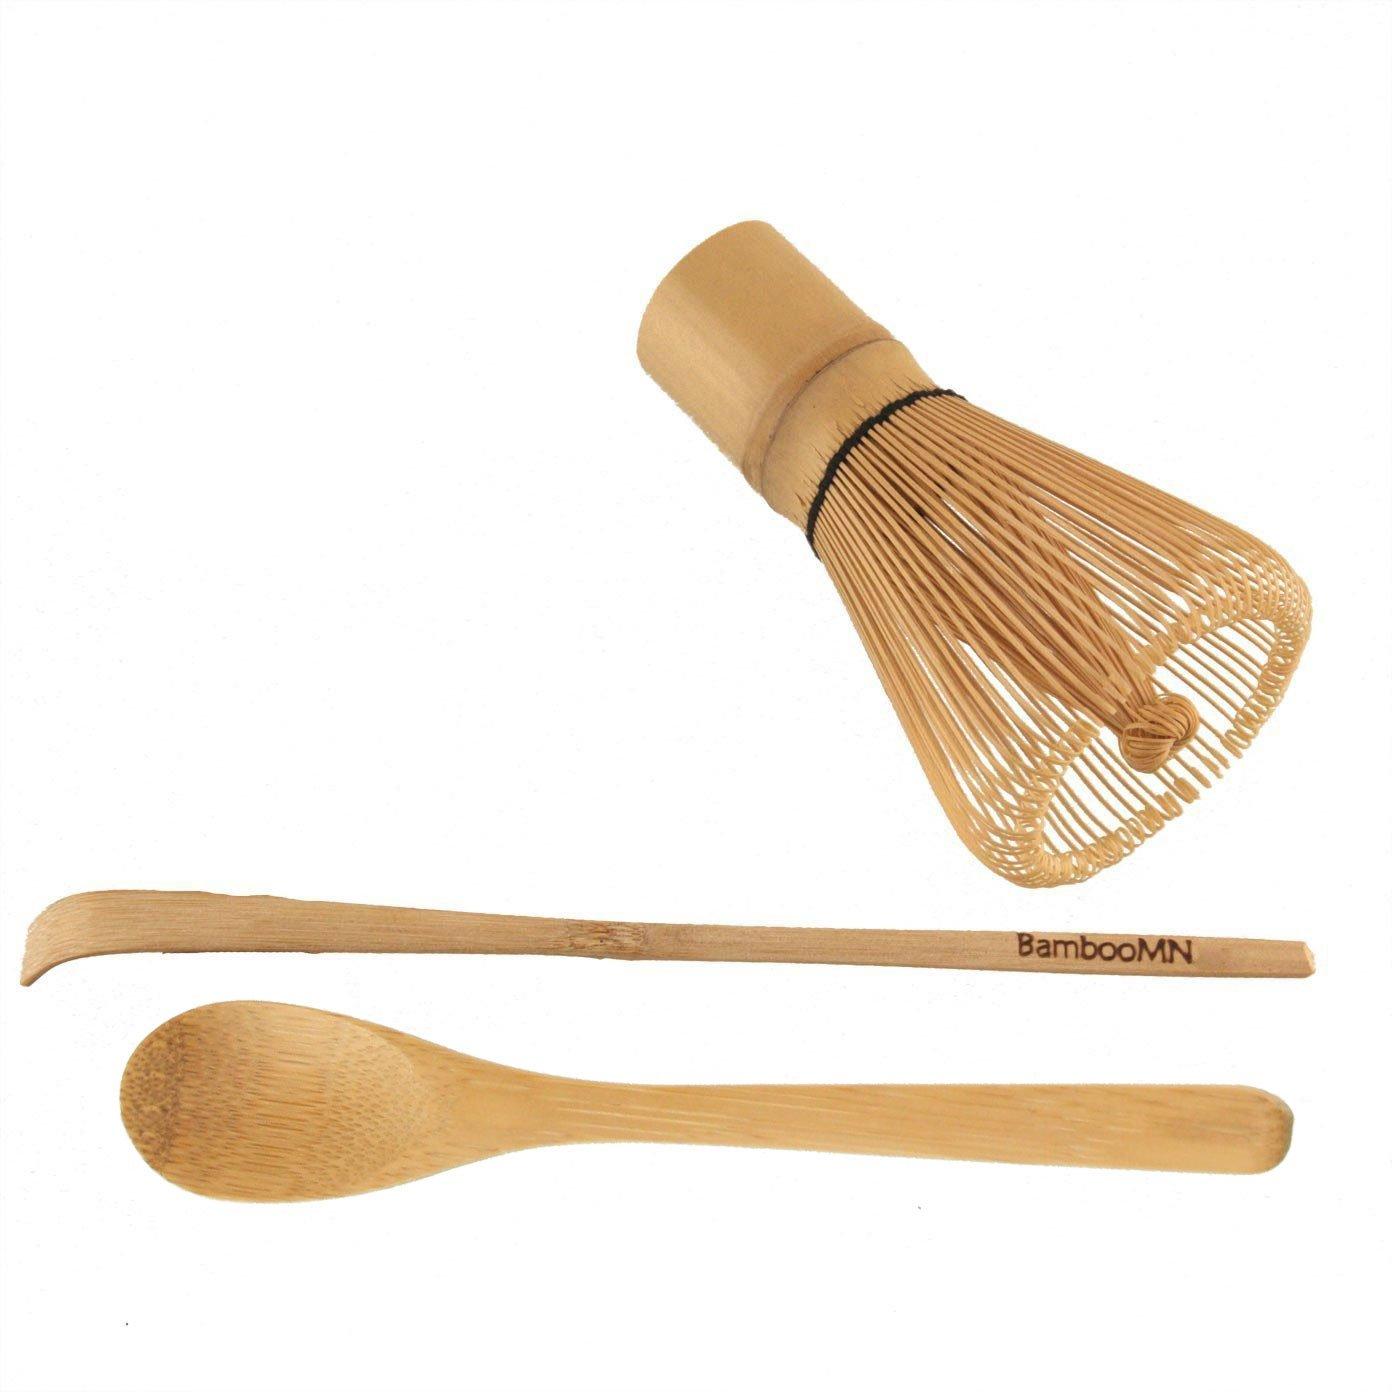 BambooMN Matcha Whisk Set - Golden Chasen (Tea Whisk), Chashaku (Hooked Bamboo Scoop), Tea Spoon - 10 Sets by BambooMN